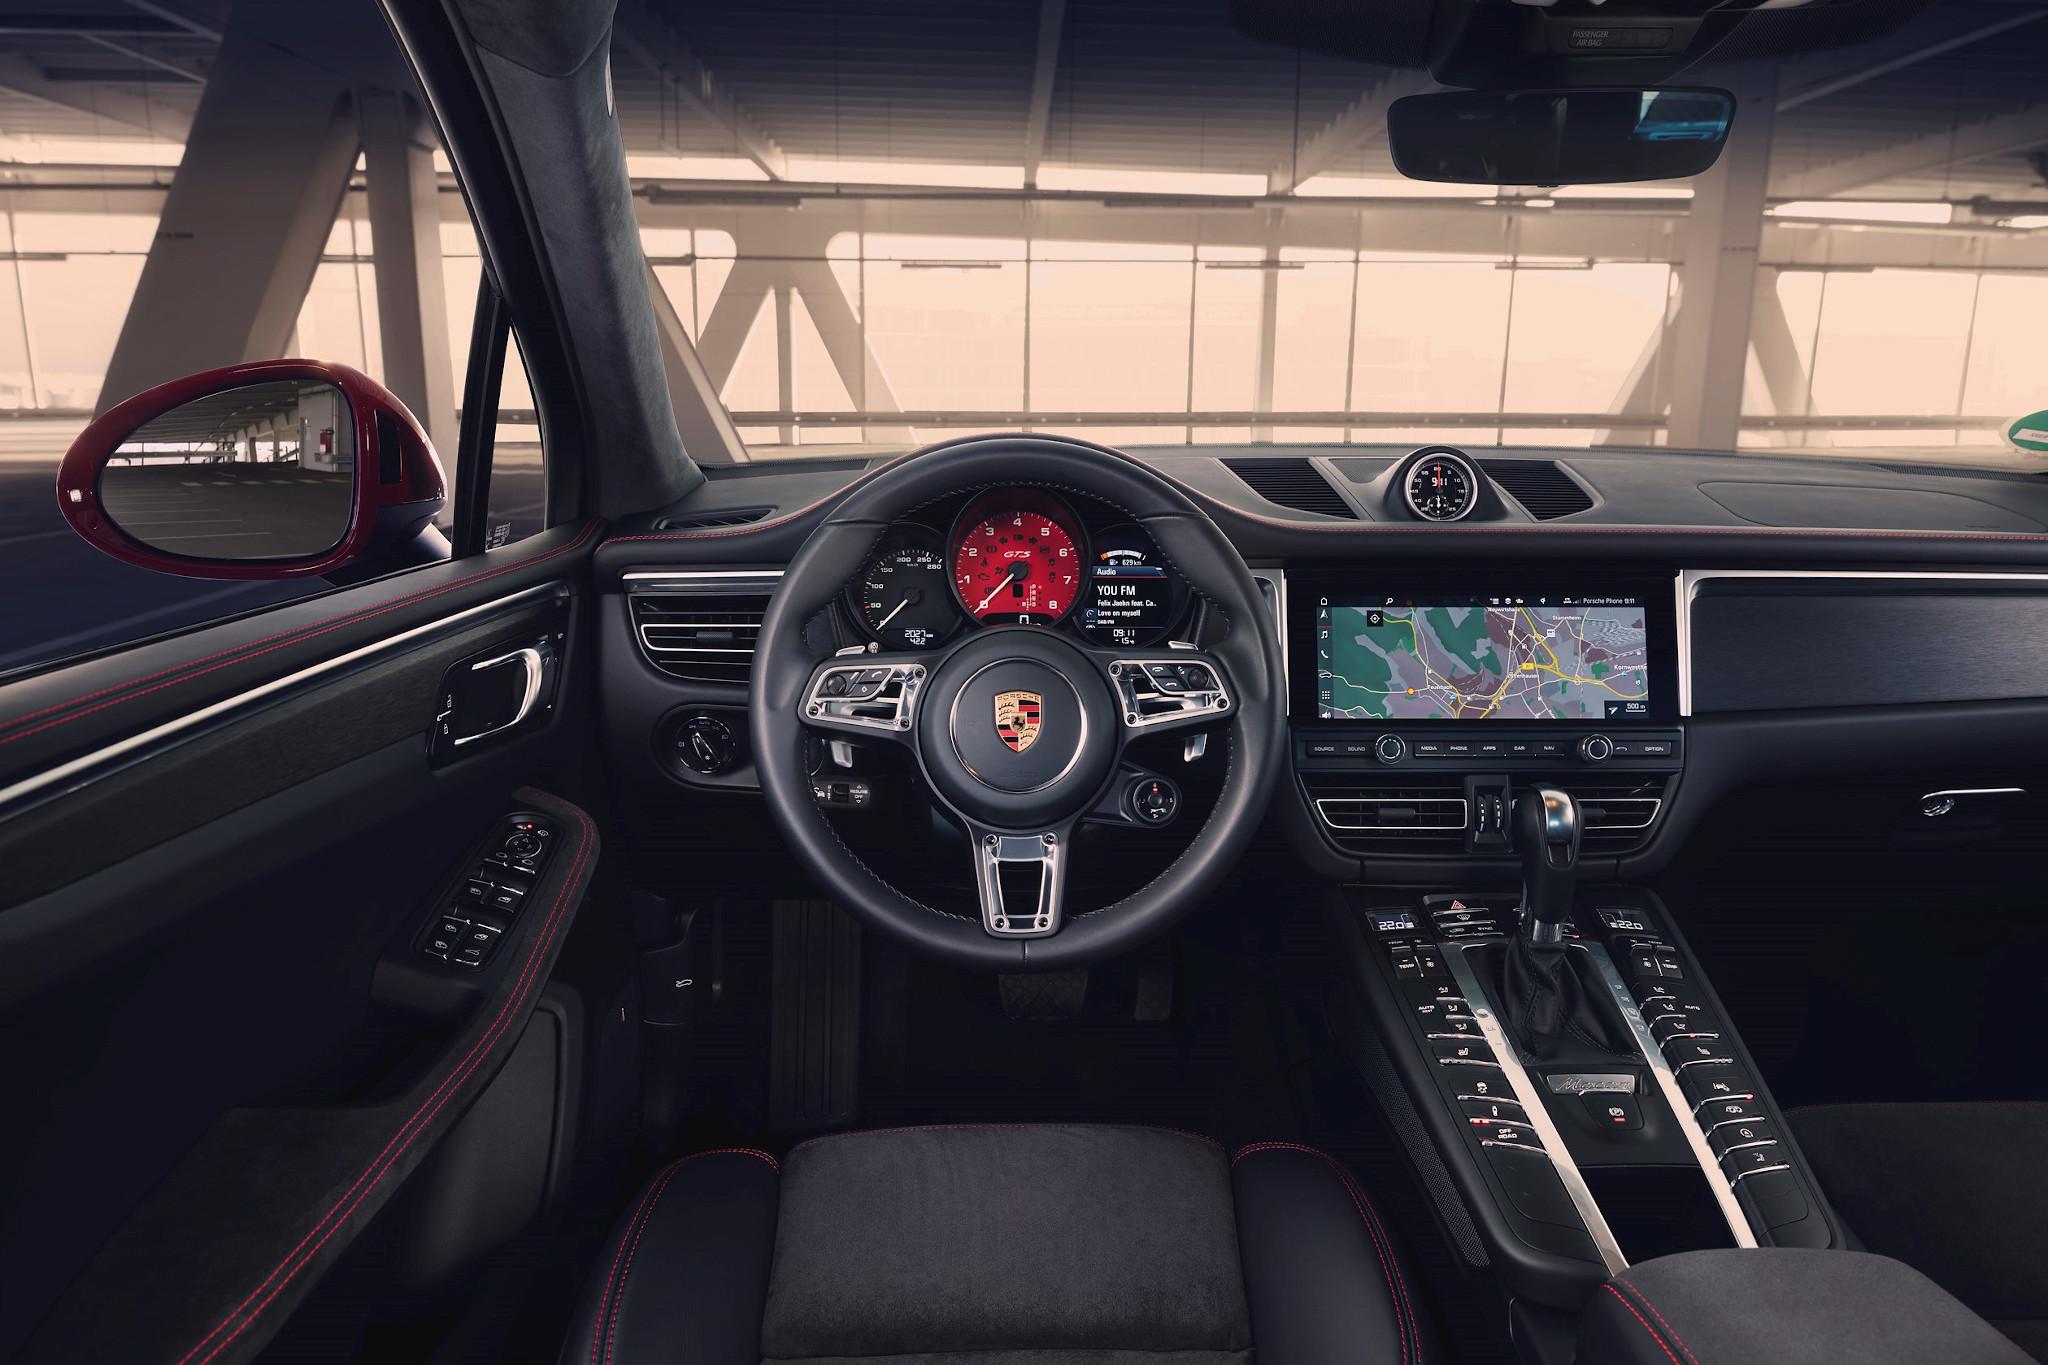 porsche-macan-gts-2020-05-cockpit-shot-interior.jpg